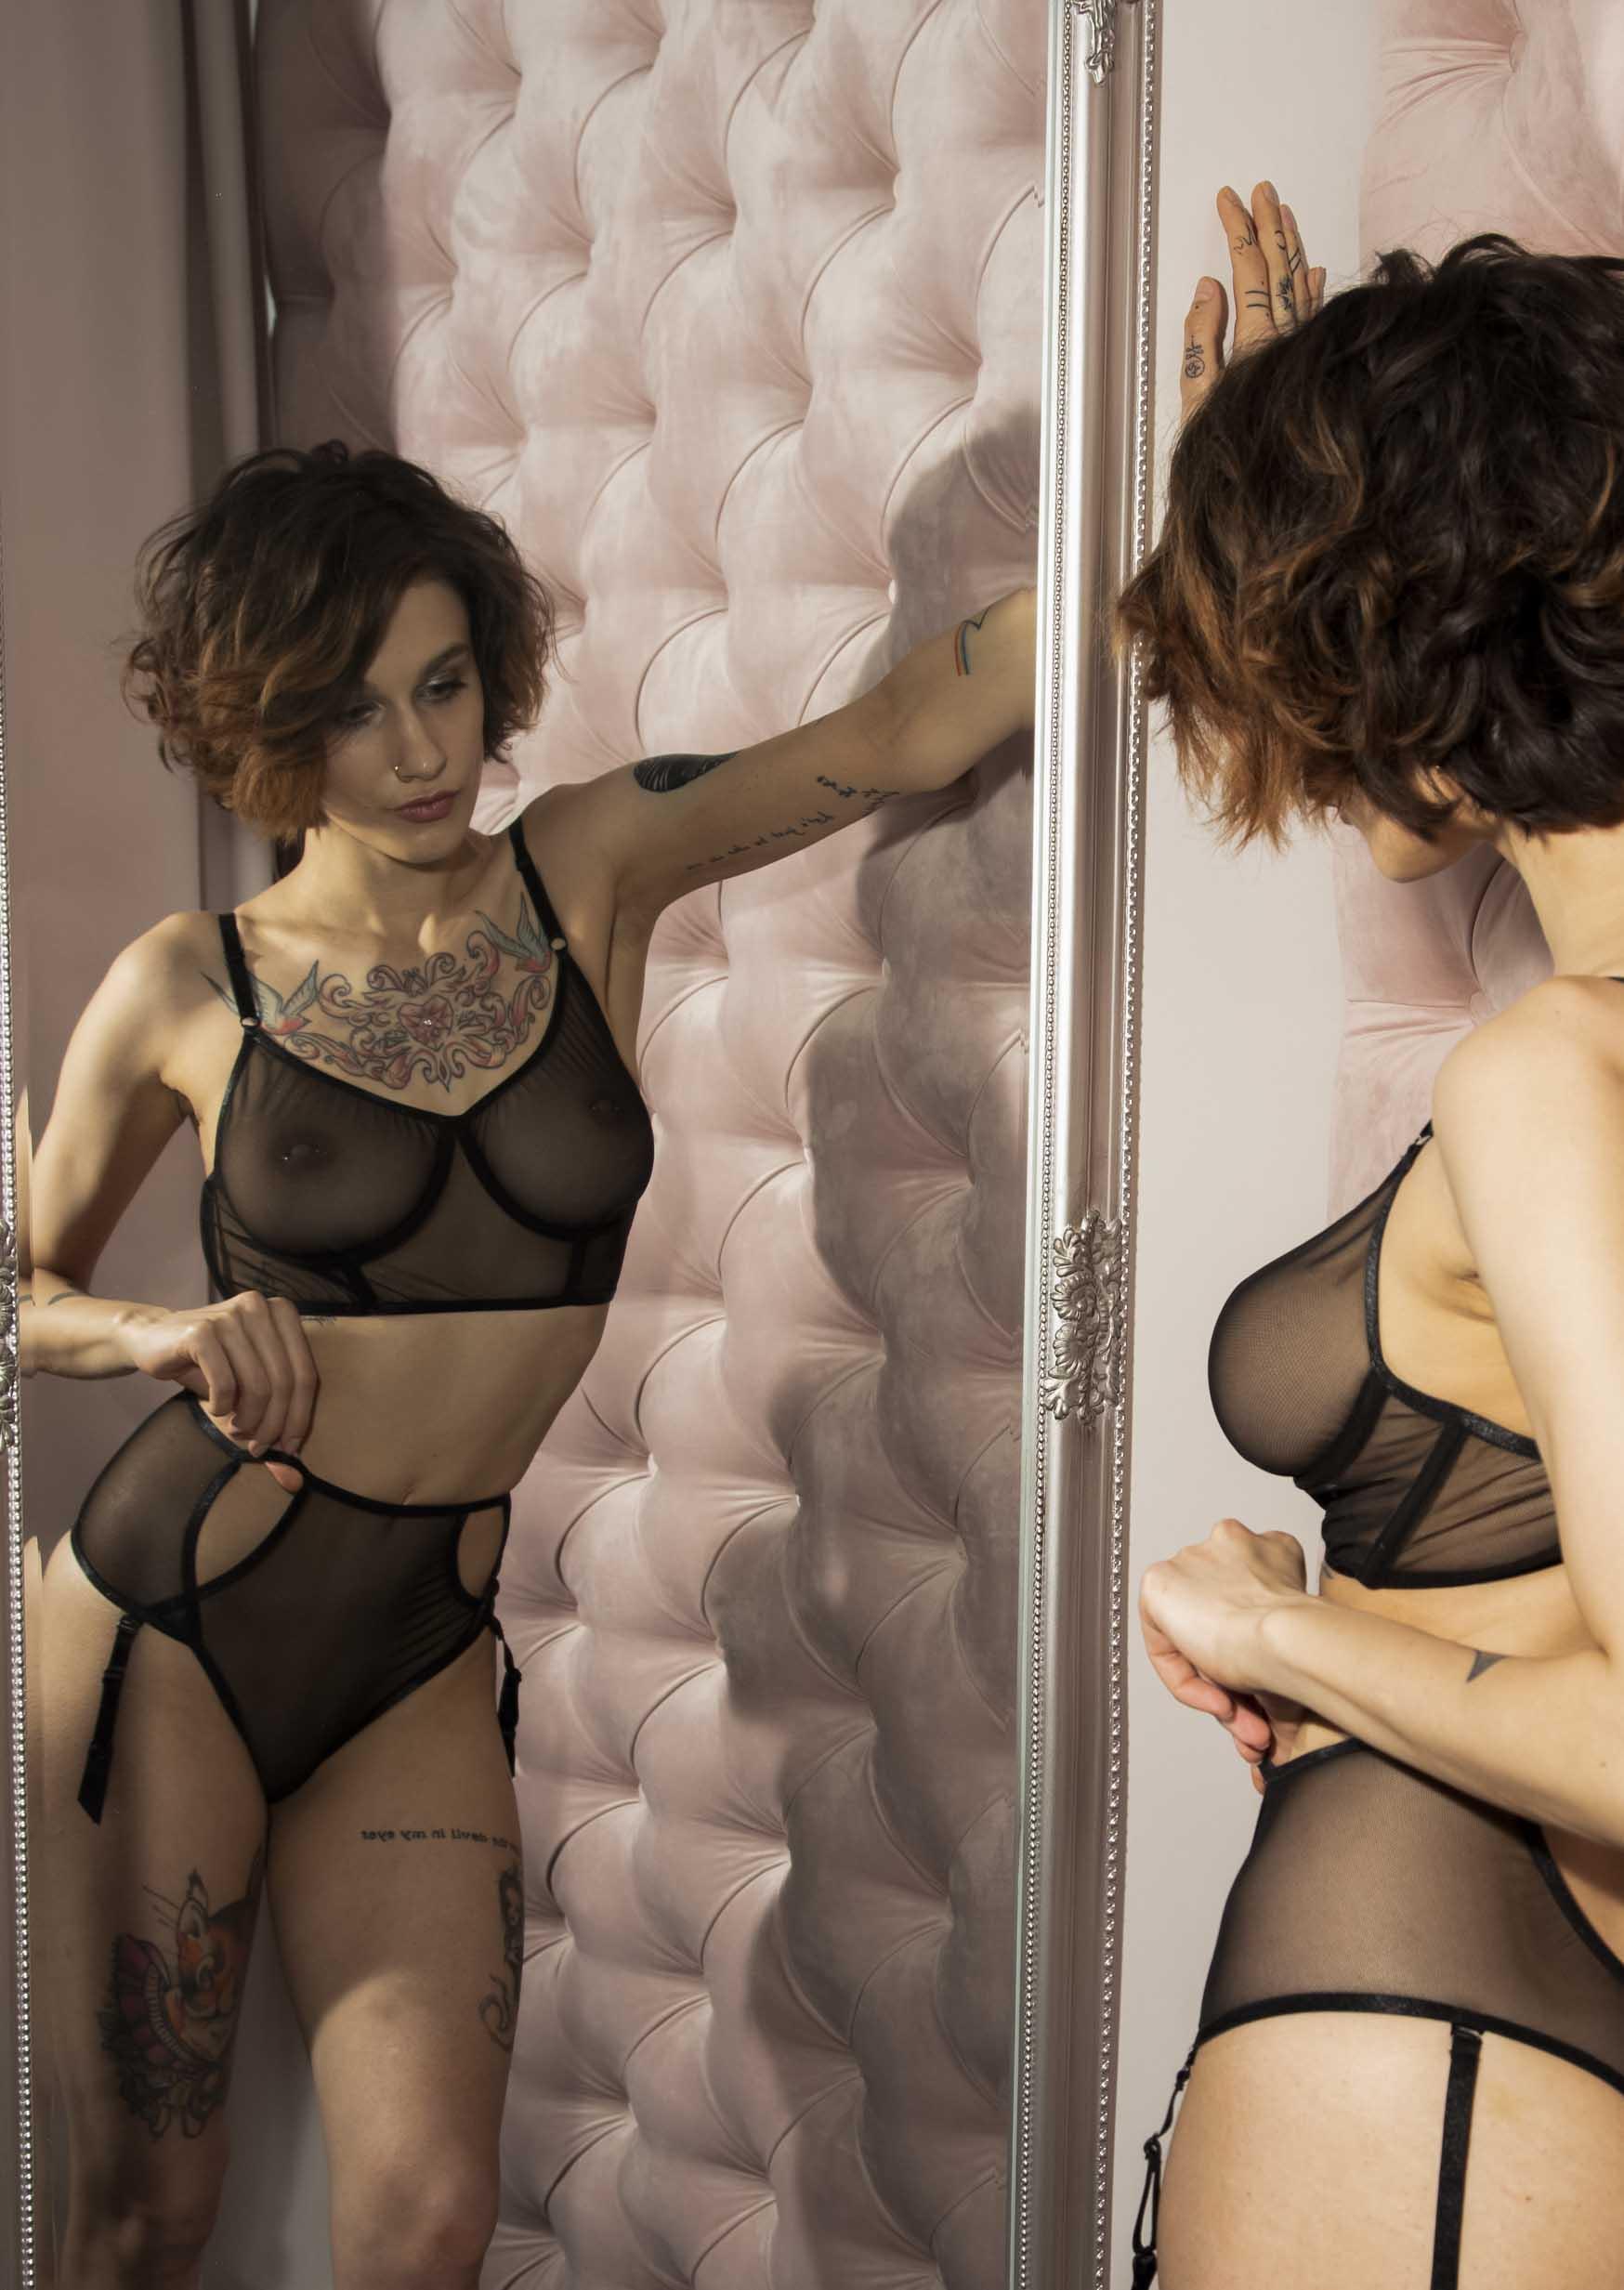 Sonata lingerie set erotic clear black lingerie with straps